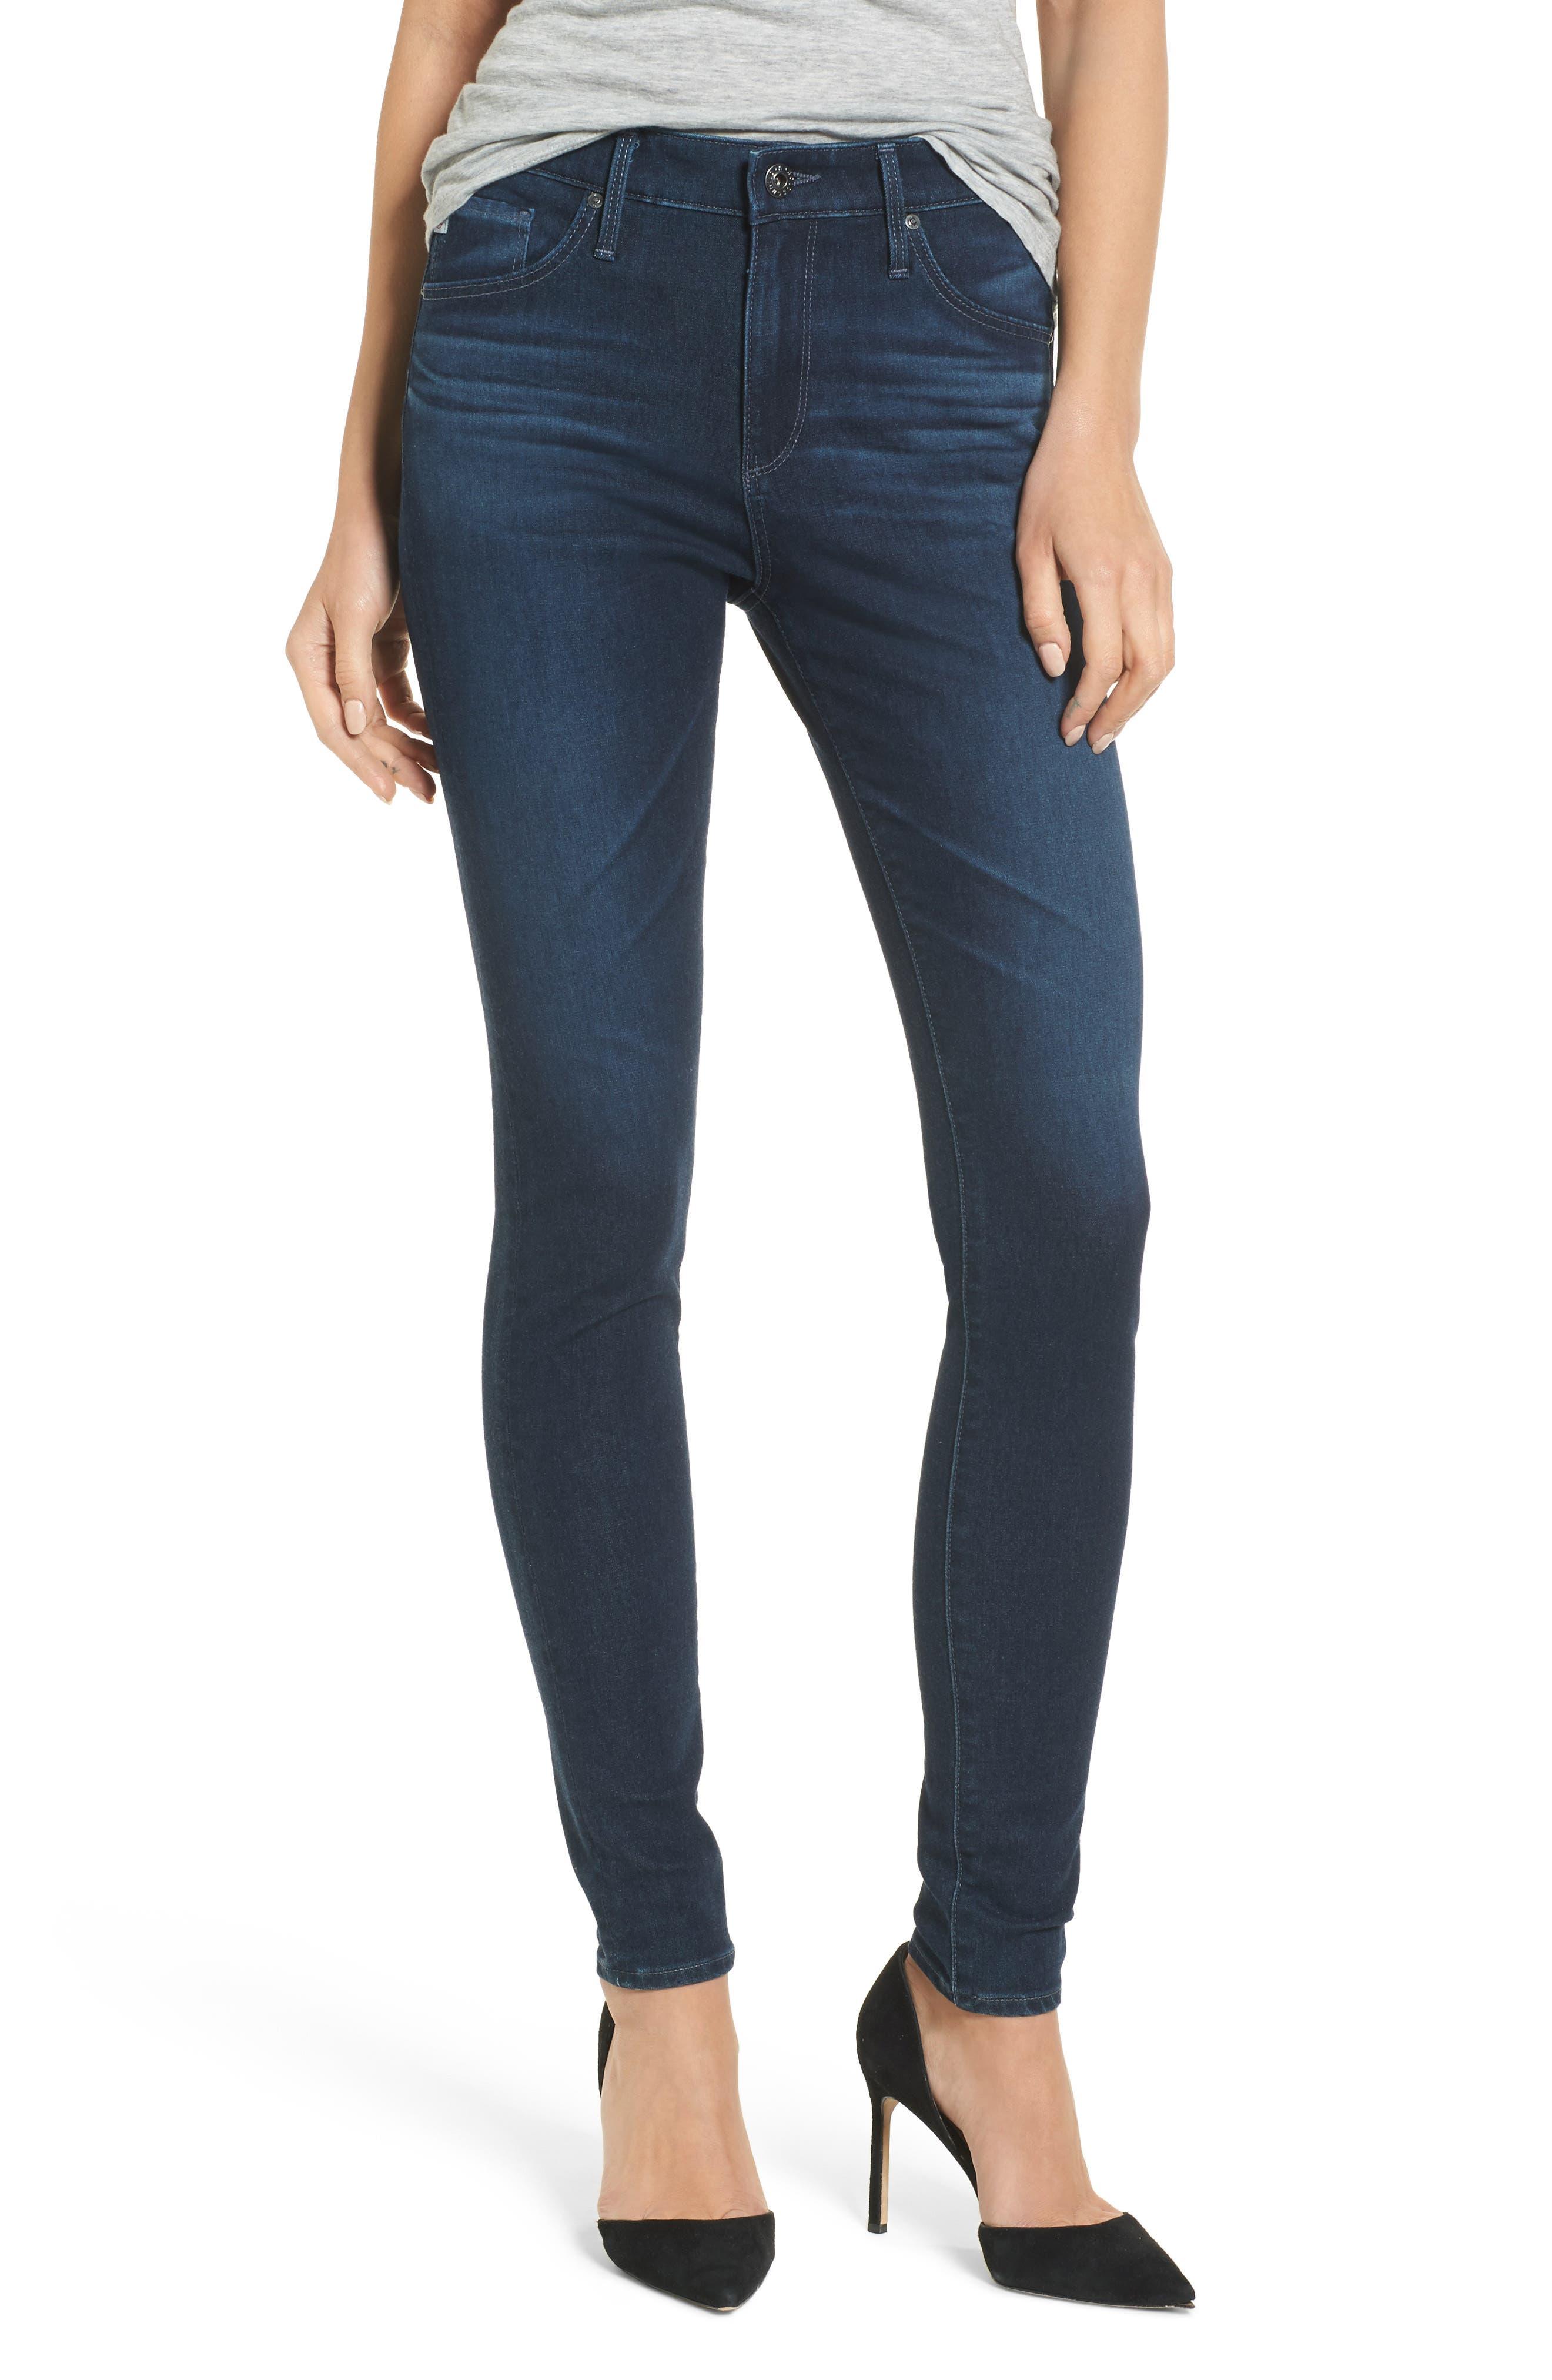 Alternate Image 1 Selected - AG The Farrah High Waist Skinny Jeans